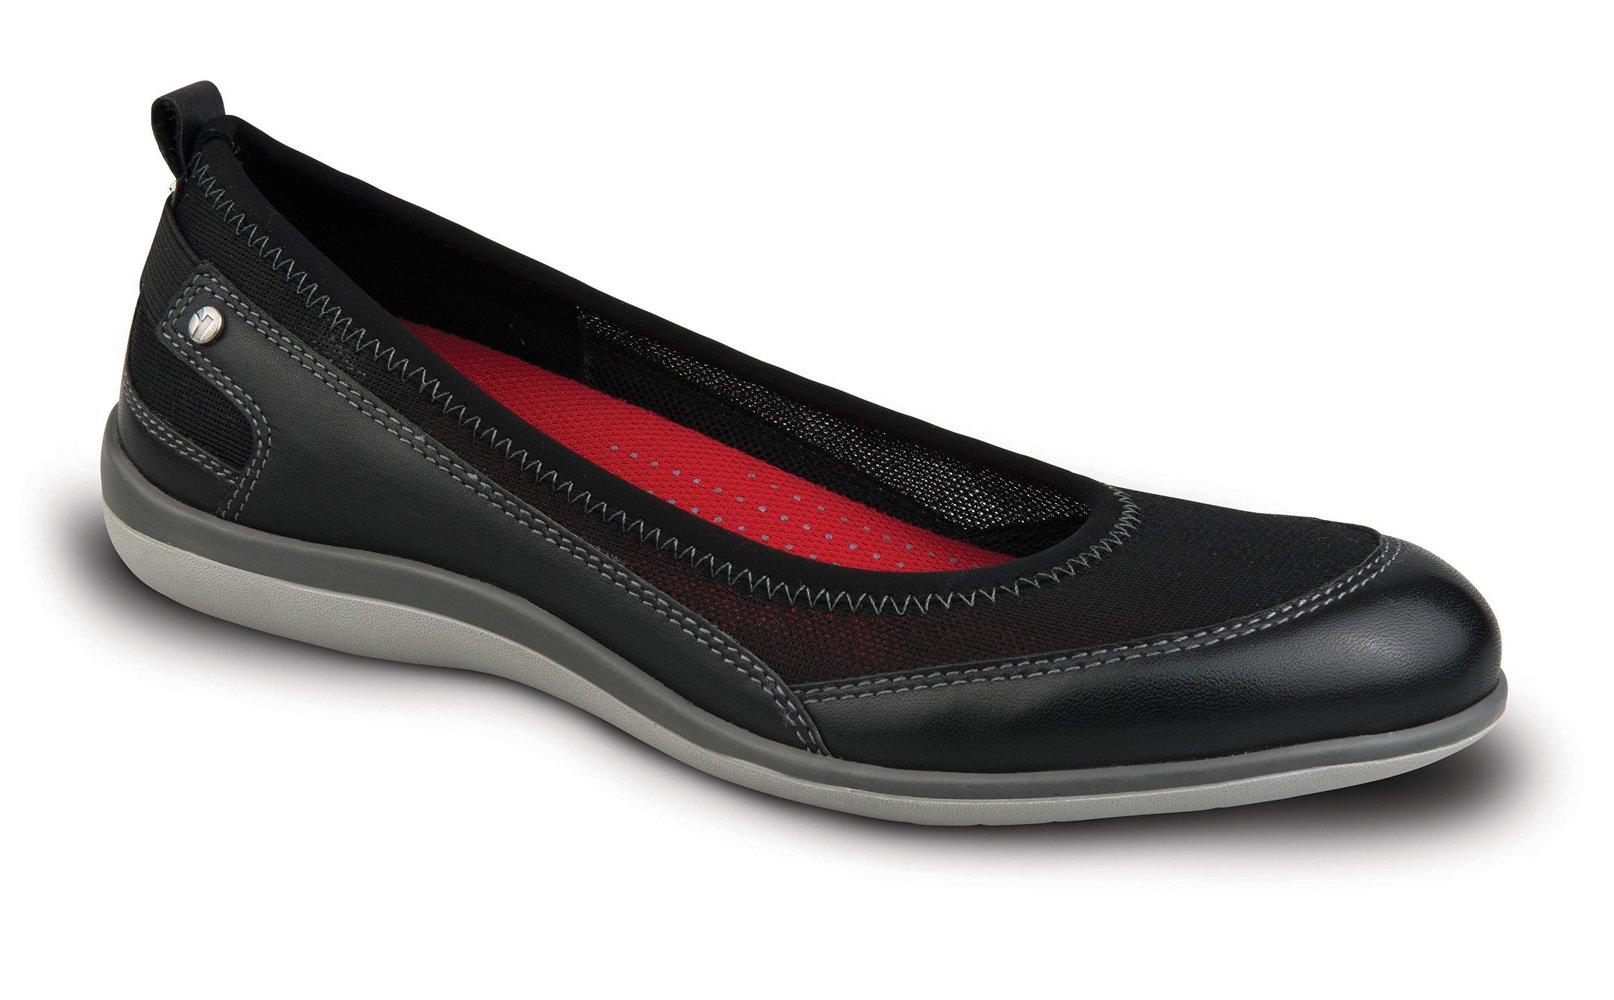 Revere Verona Women's Comfort Shoe with Removable Foot Bed: Black 10 Medium (B) Slip on